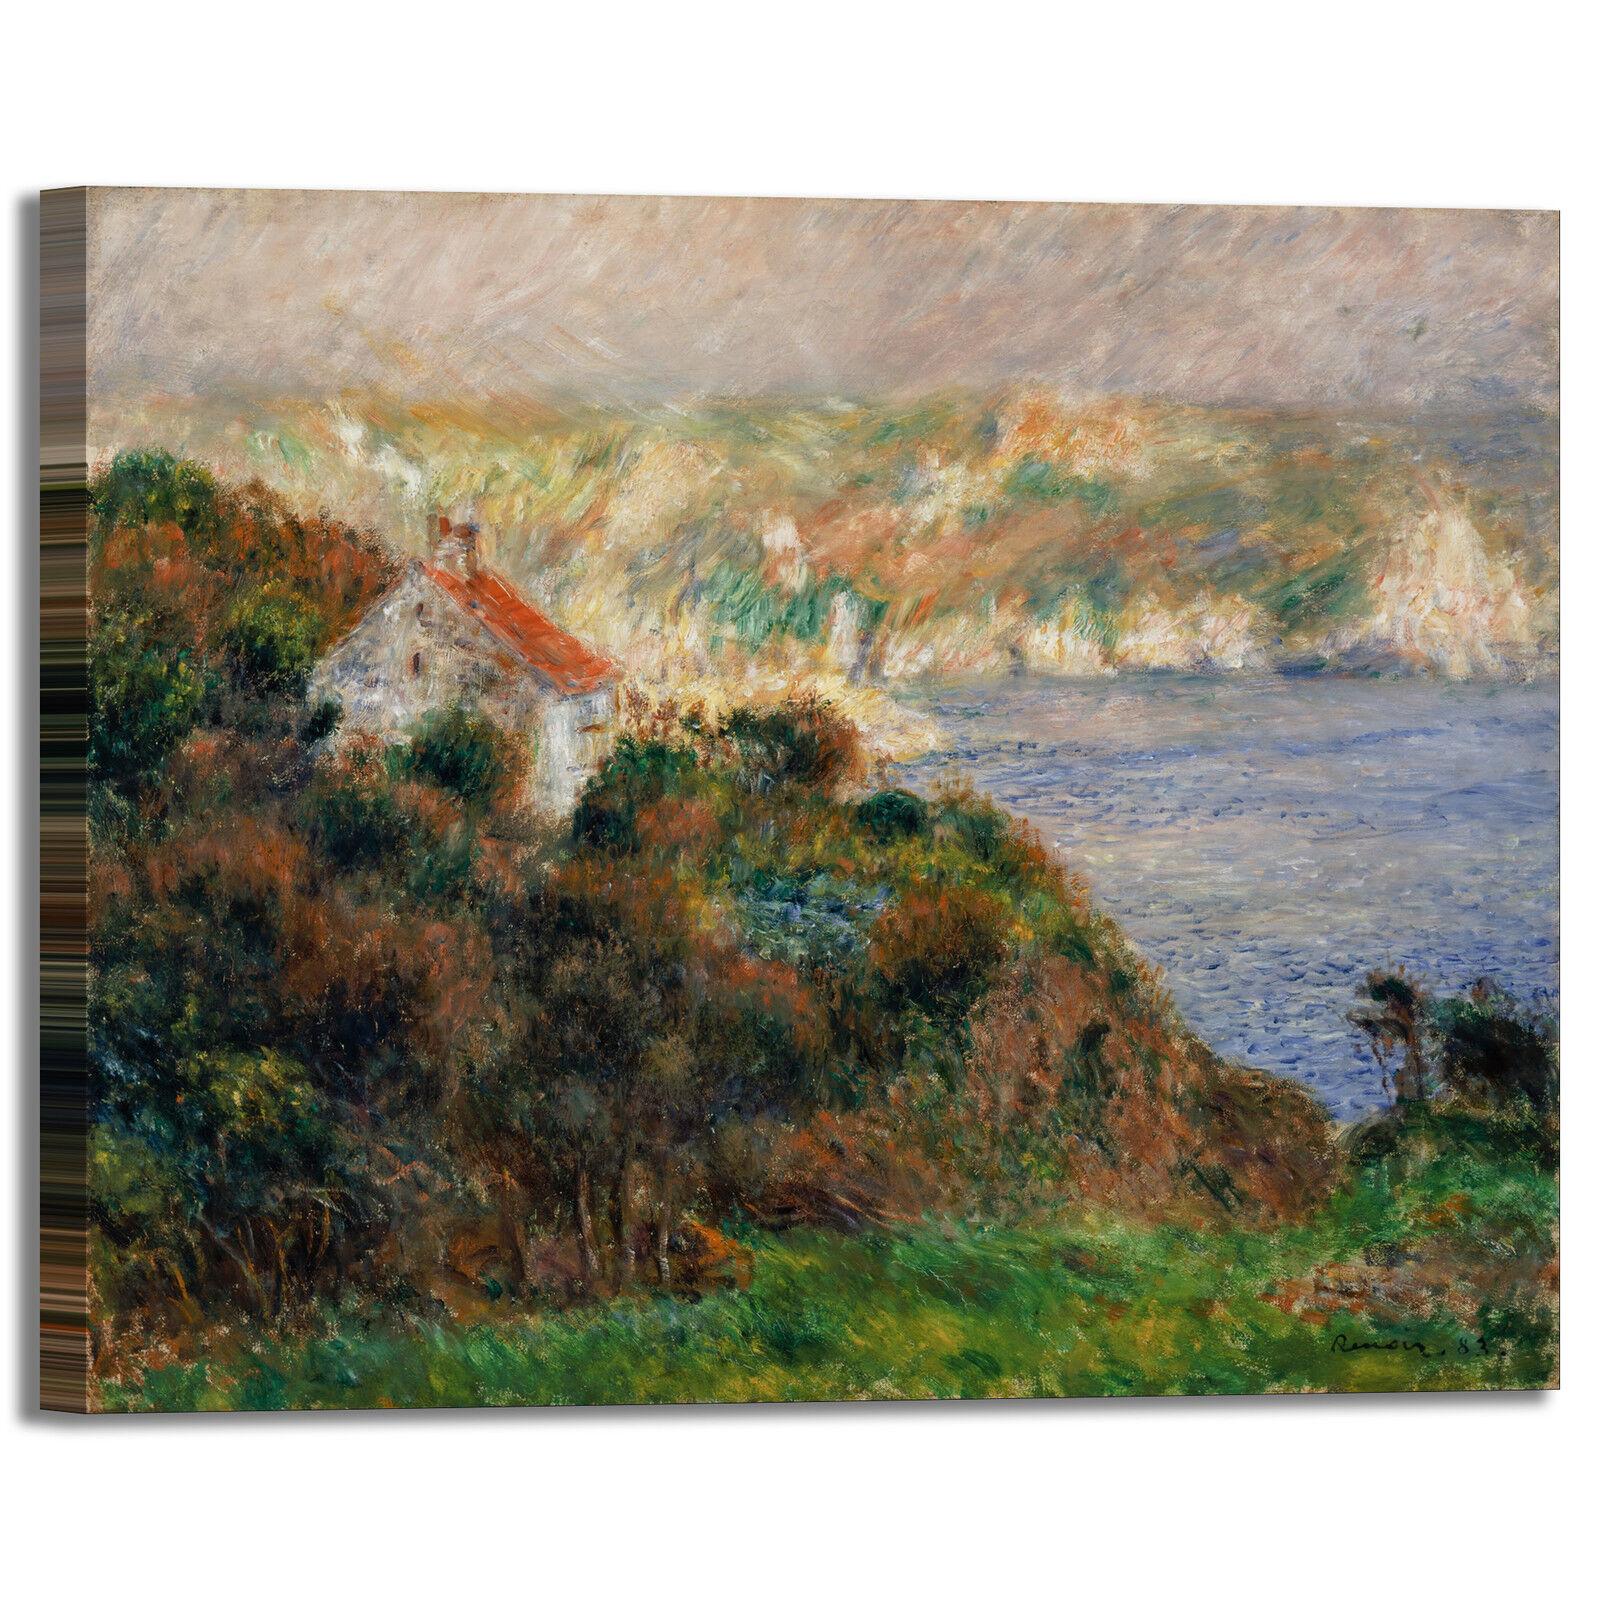 Renero nebbia a Guernsey design quadro stampa stampa stampa tela dipinto telaio arrossoo casa 290993